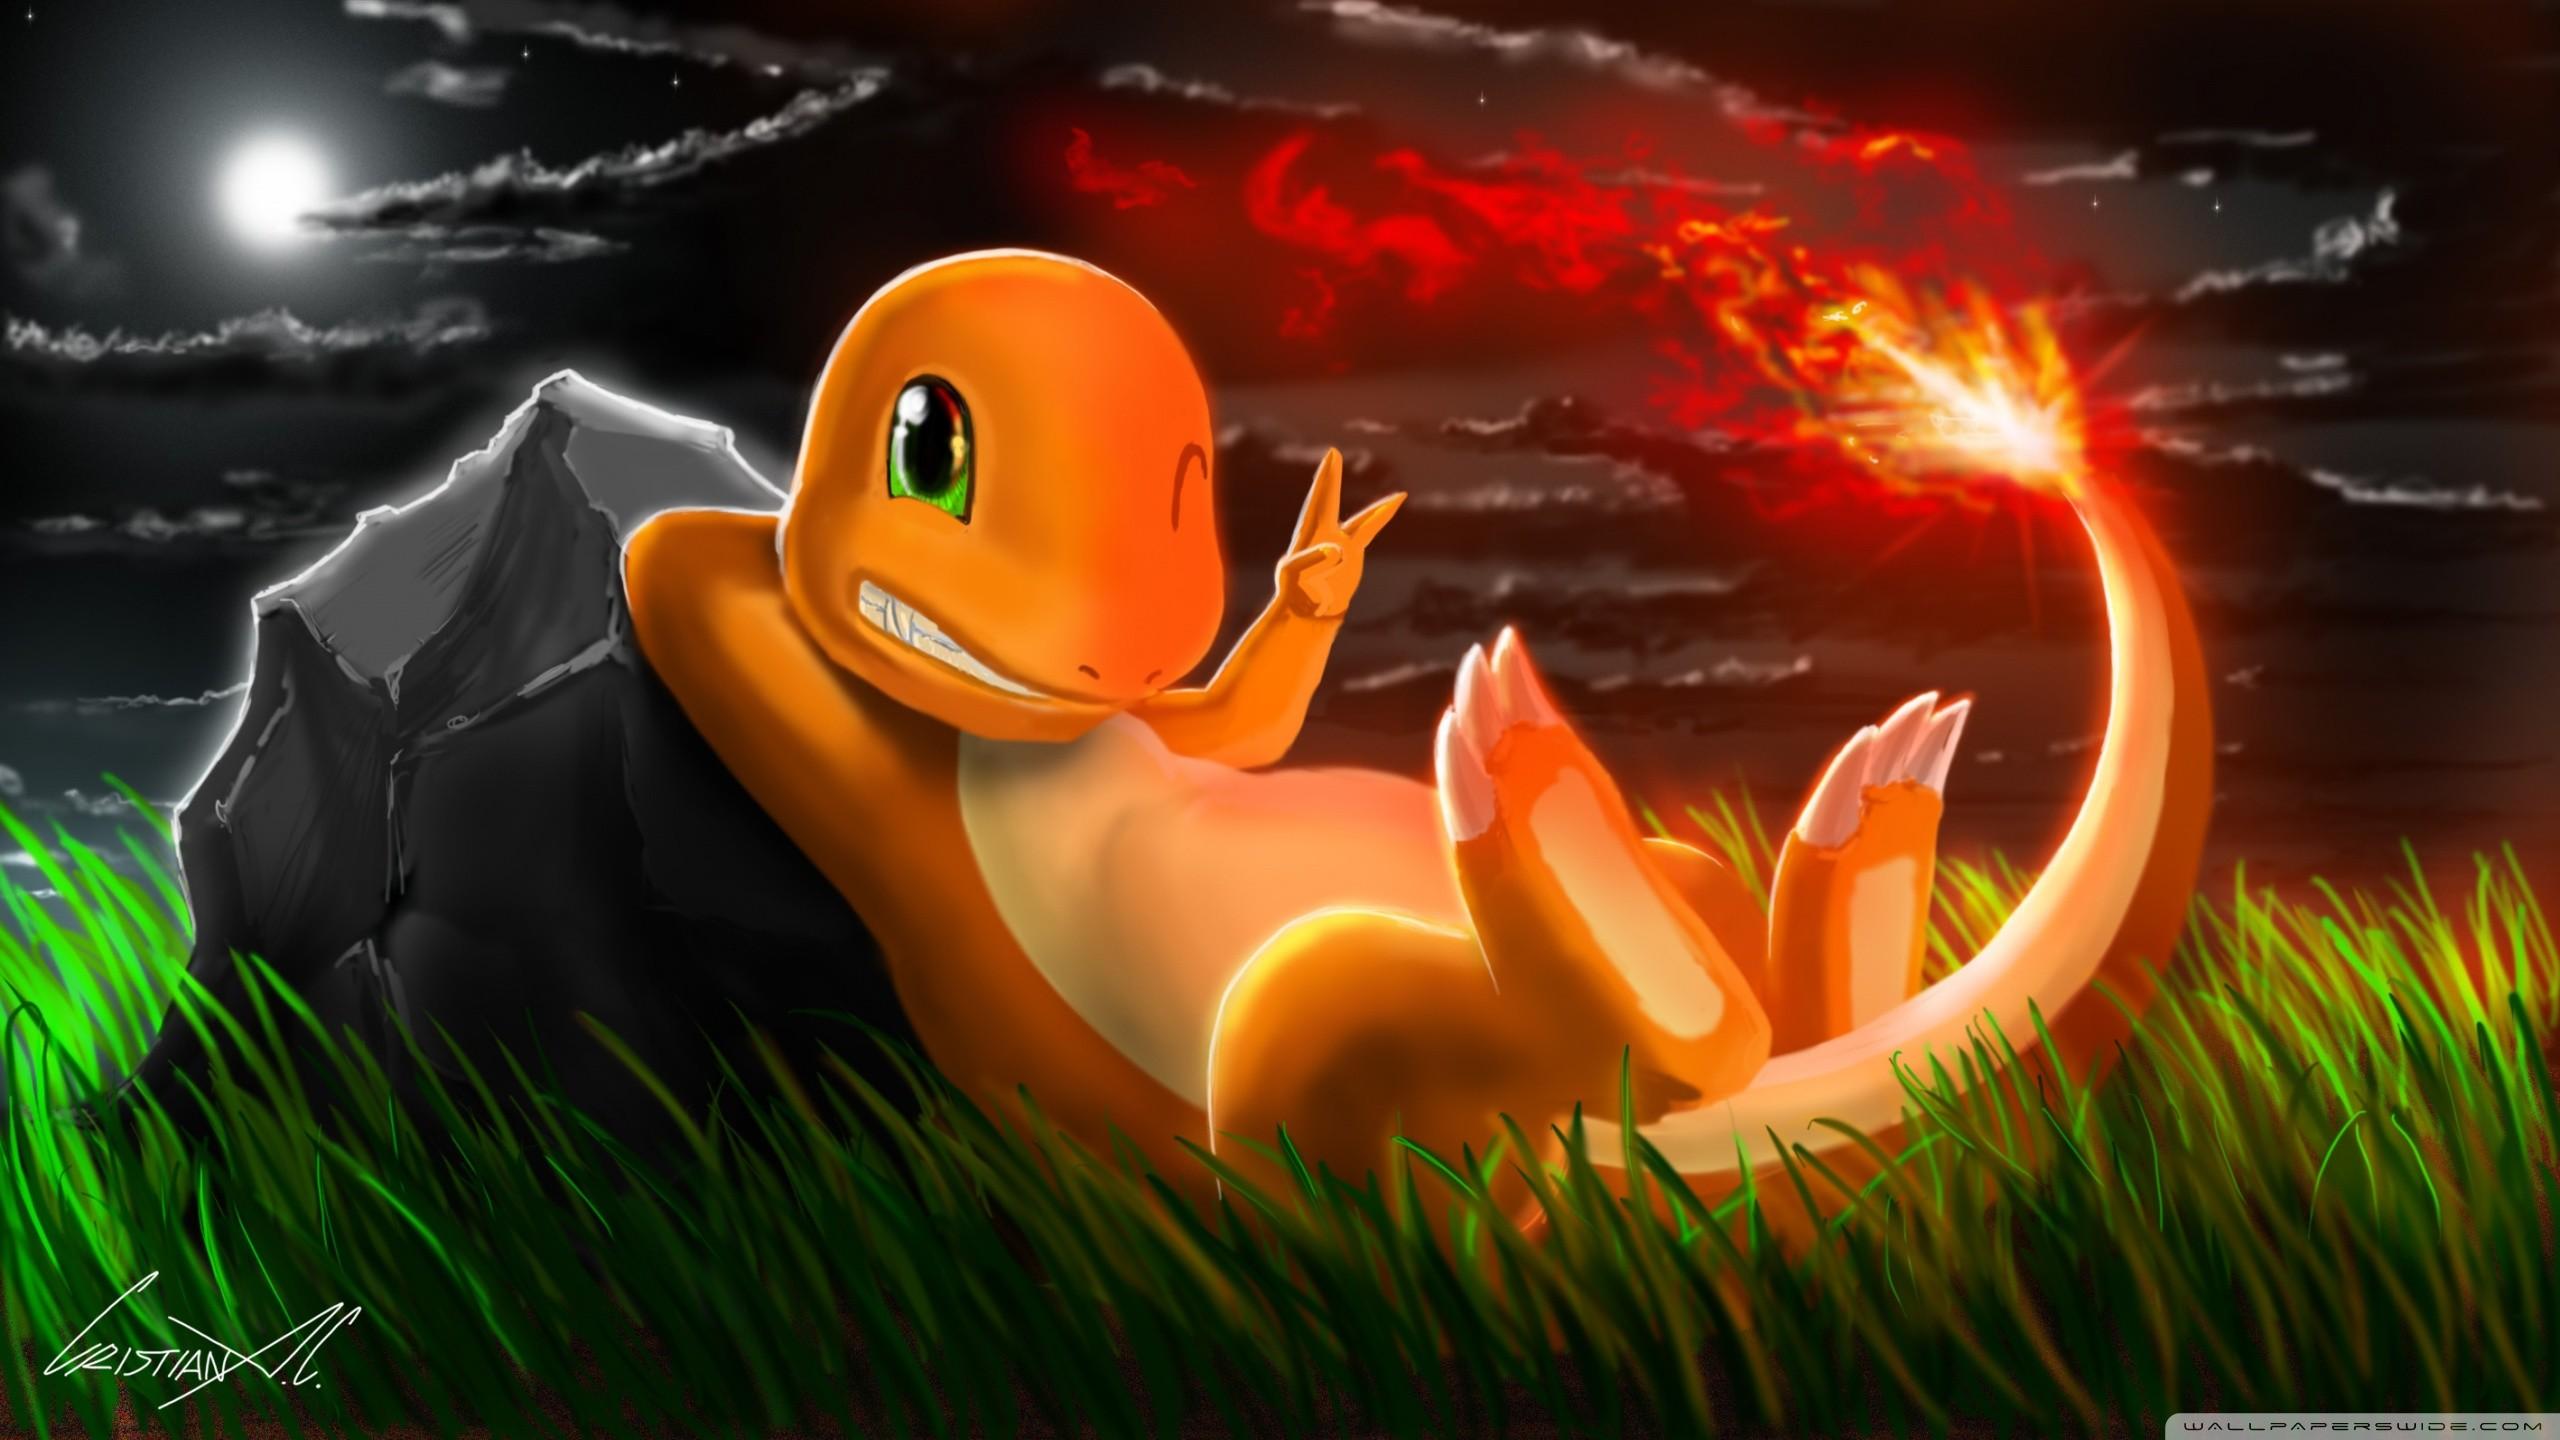 Fond d'écran HD | Arrière-plan ID:686172. Anime Pokémon